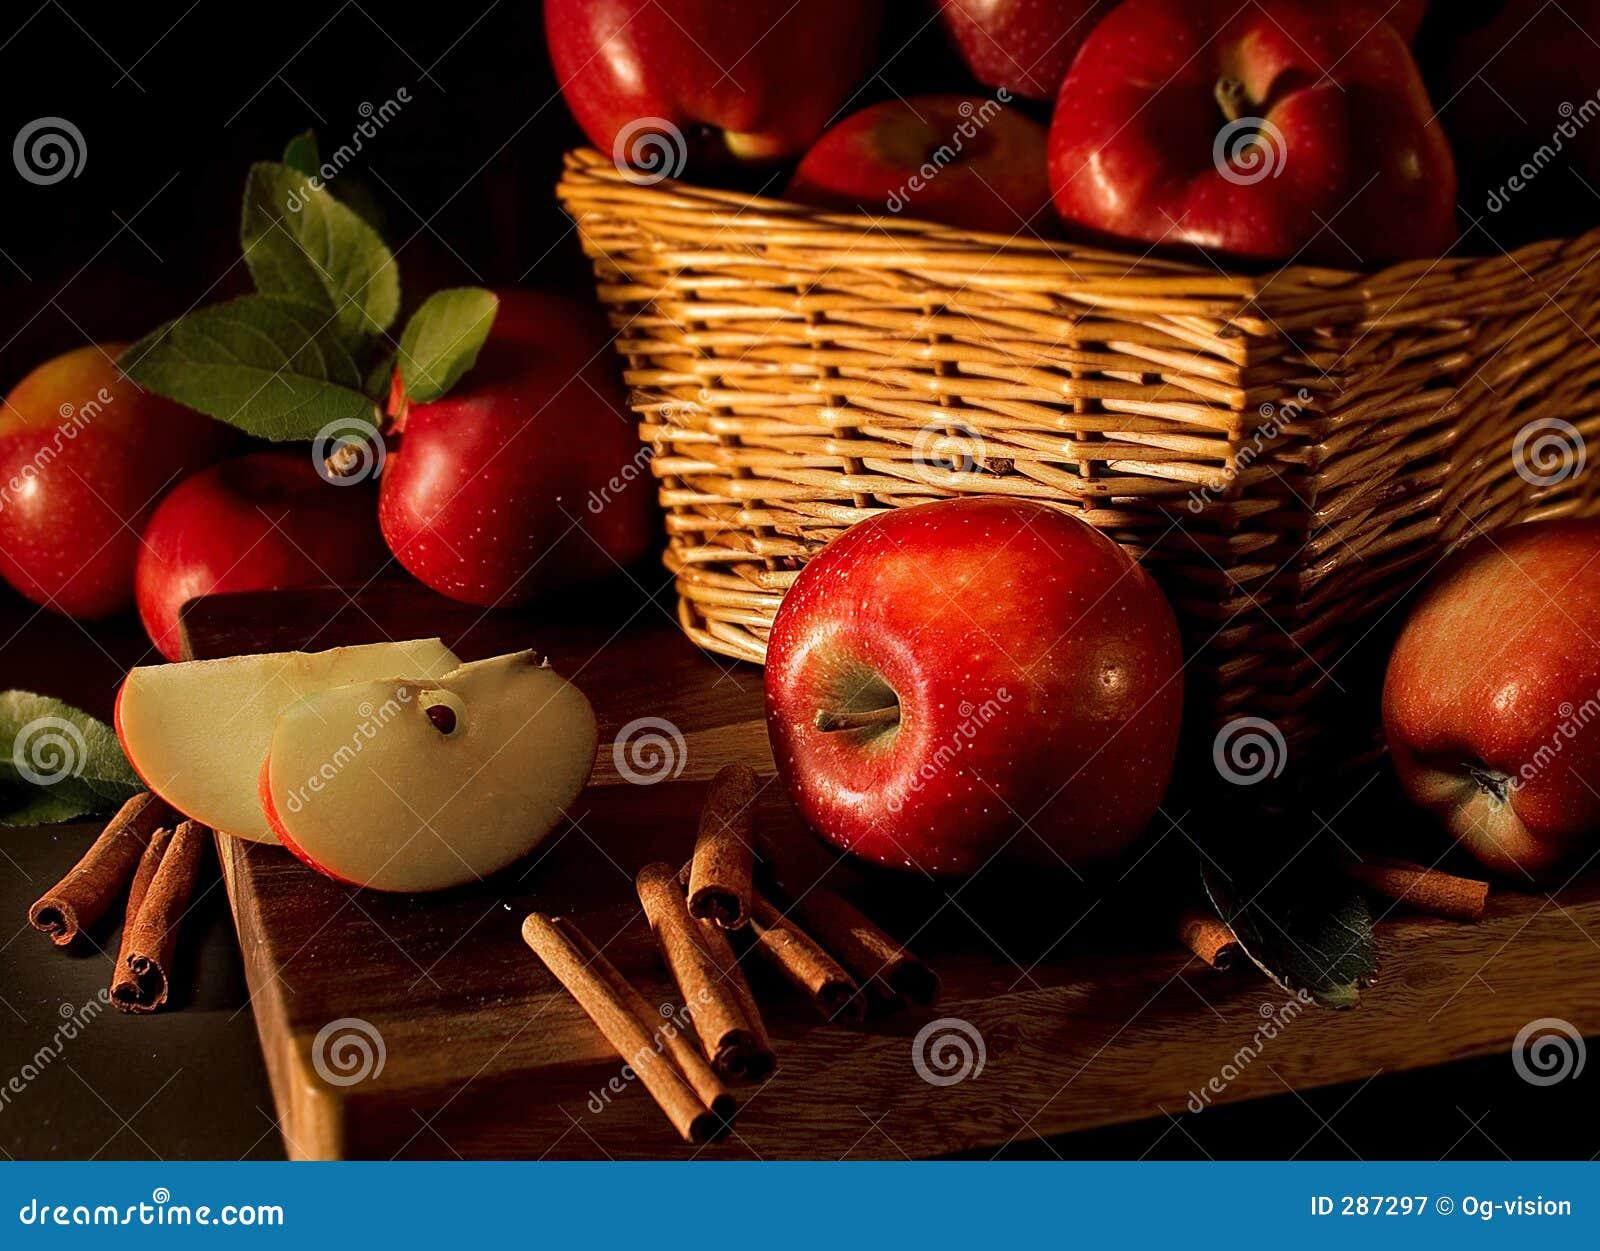 Jabłko cynamonowi kije